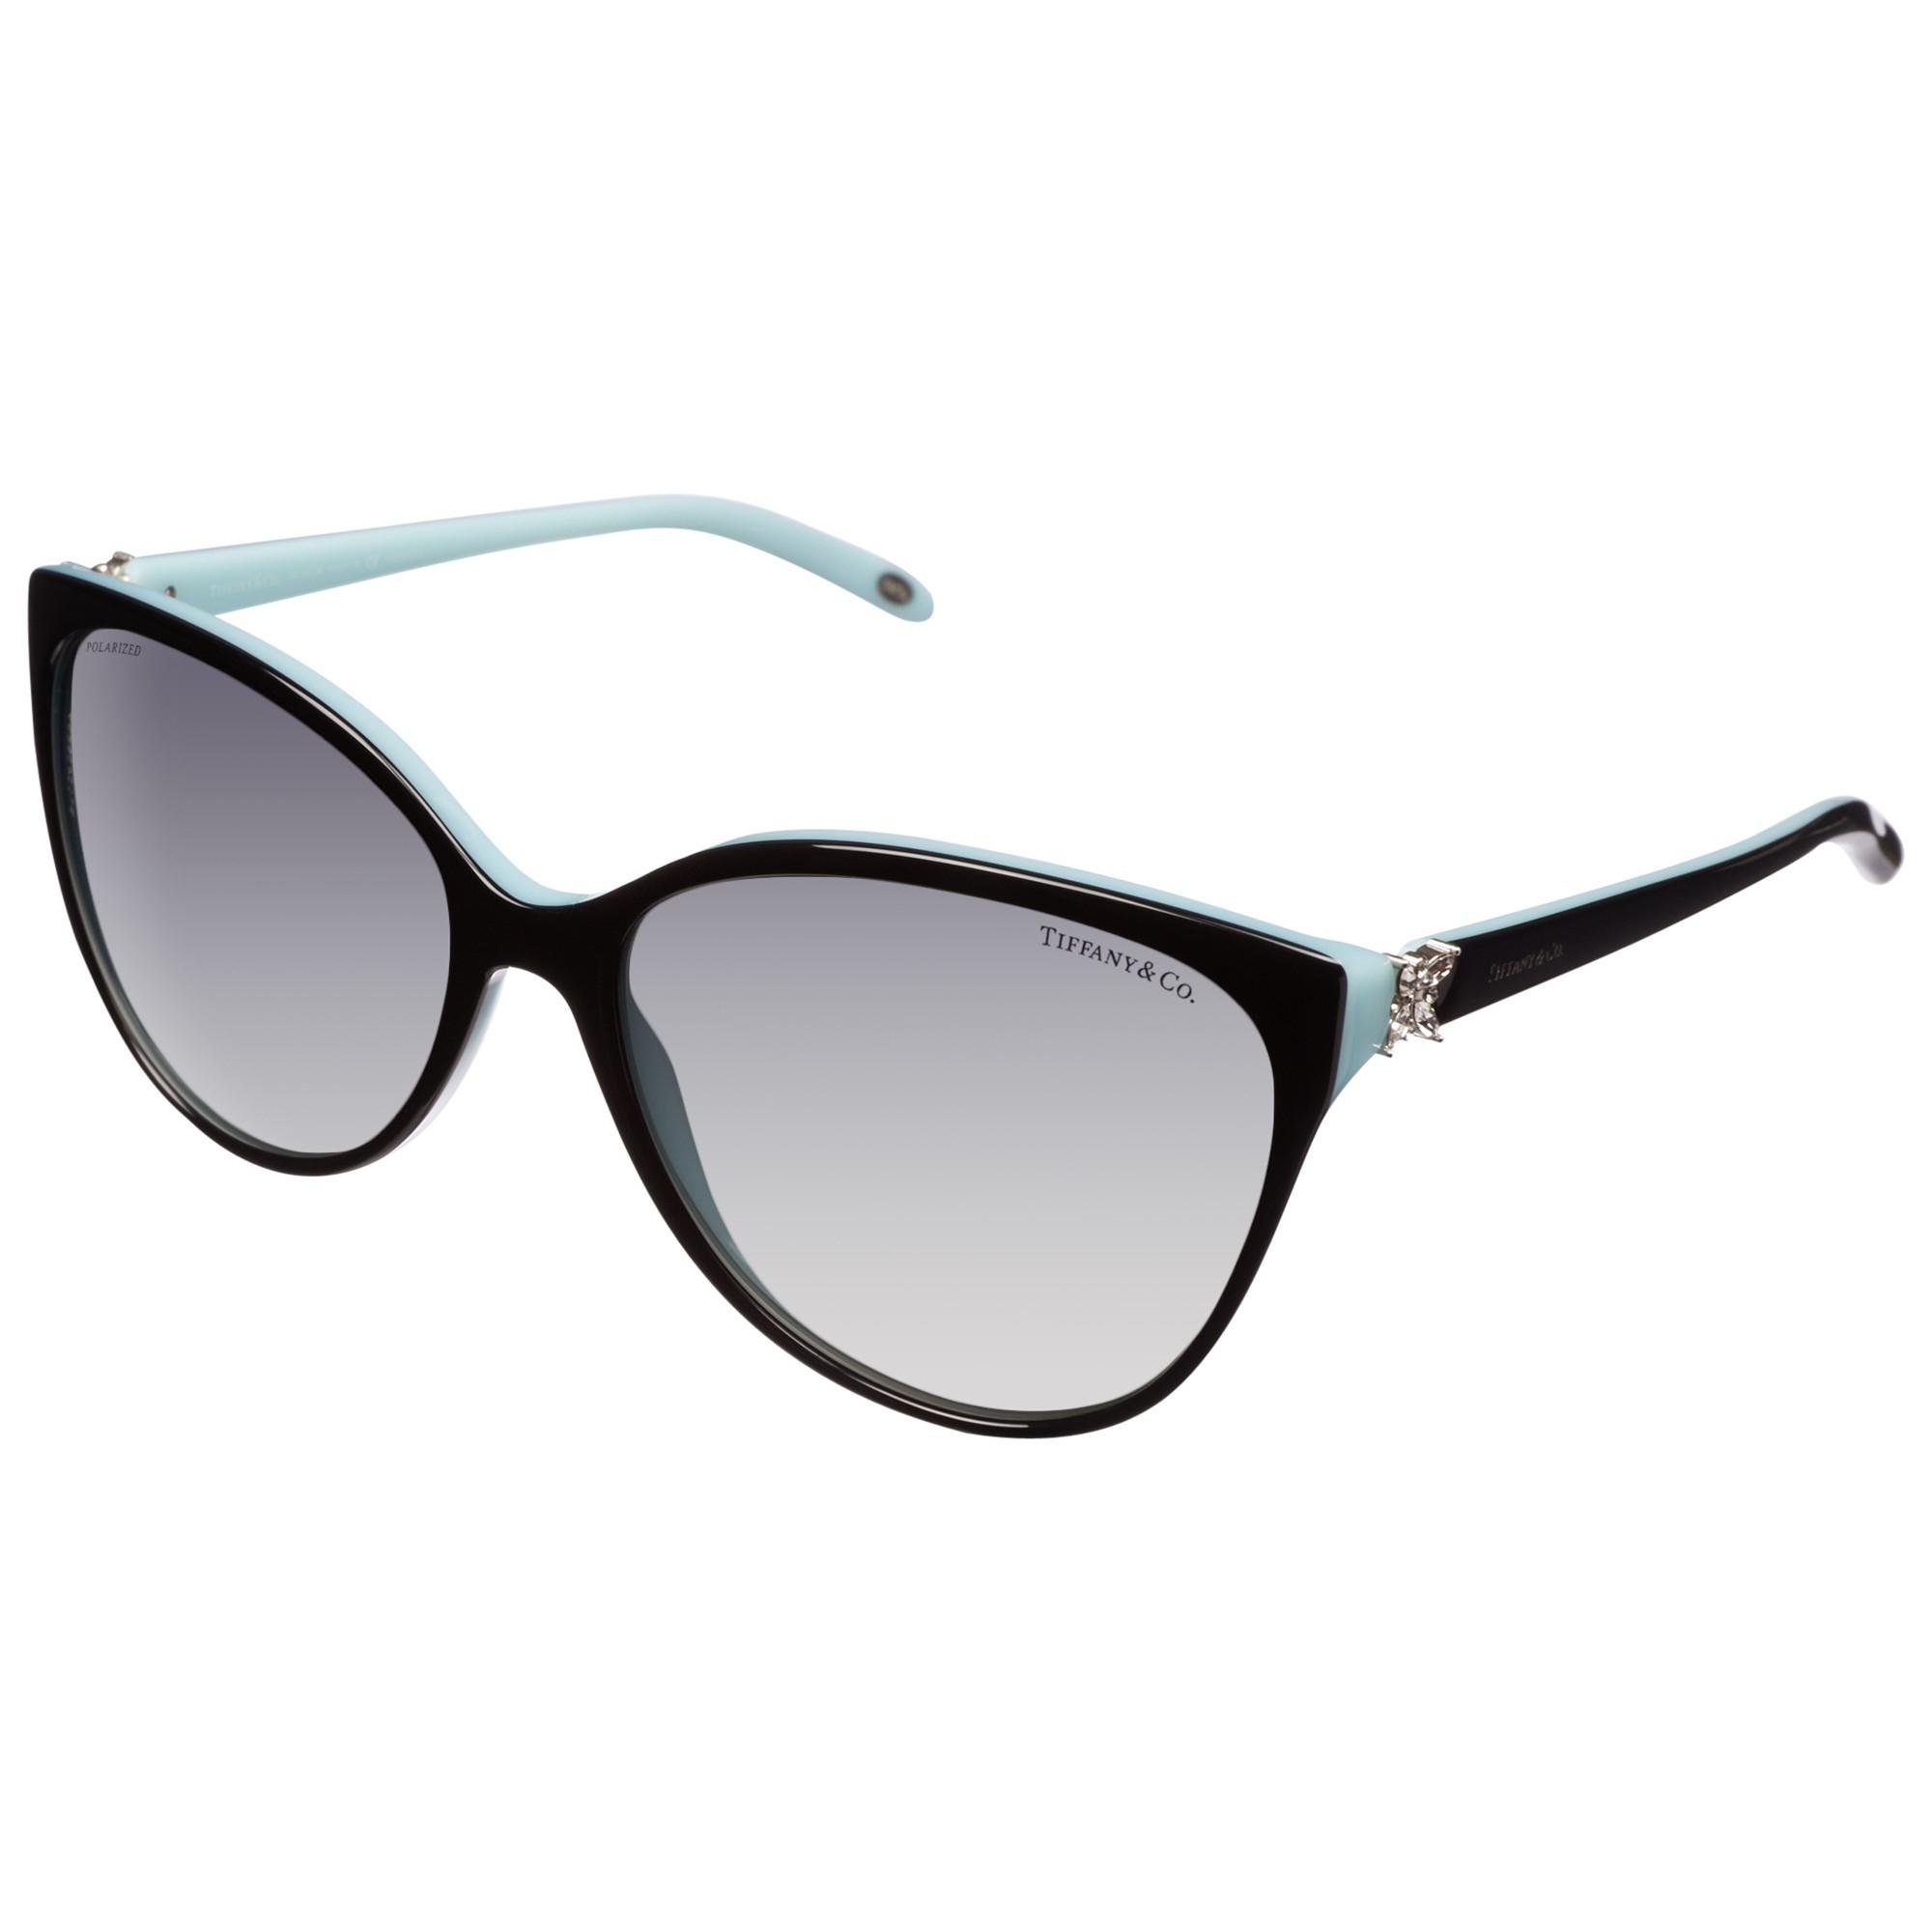 266f43a1ebf Tiffany   Co. Tf4089B Cat S Eye Sunglasses in Black - Lyst